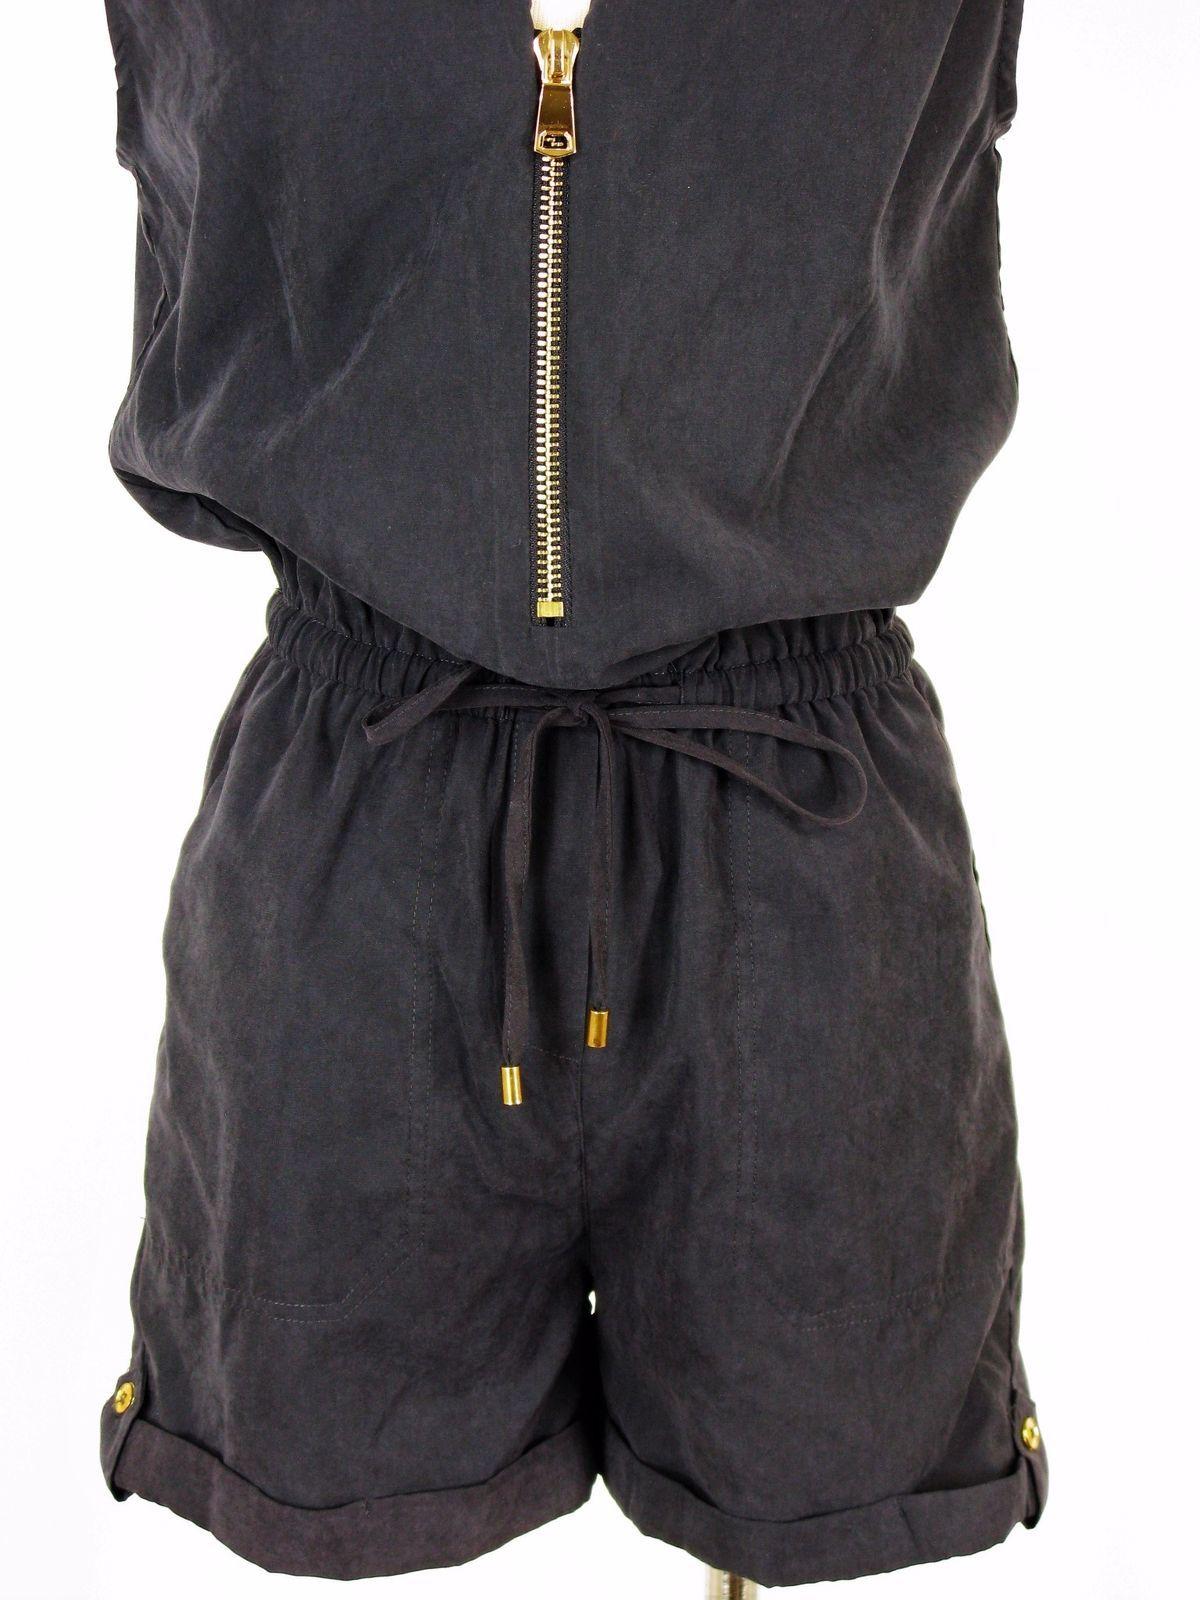 Romper Shorts Grifflin Paris Navy Blue Zipper Romper NEW $60 MSRP